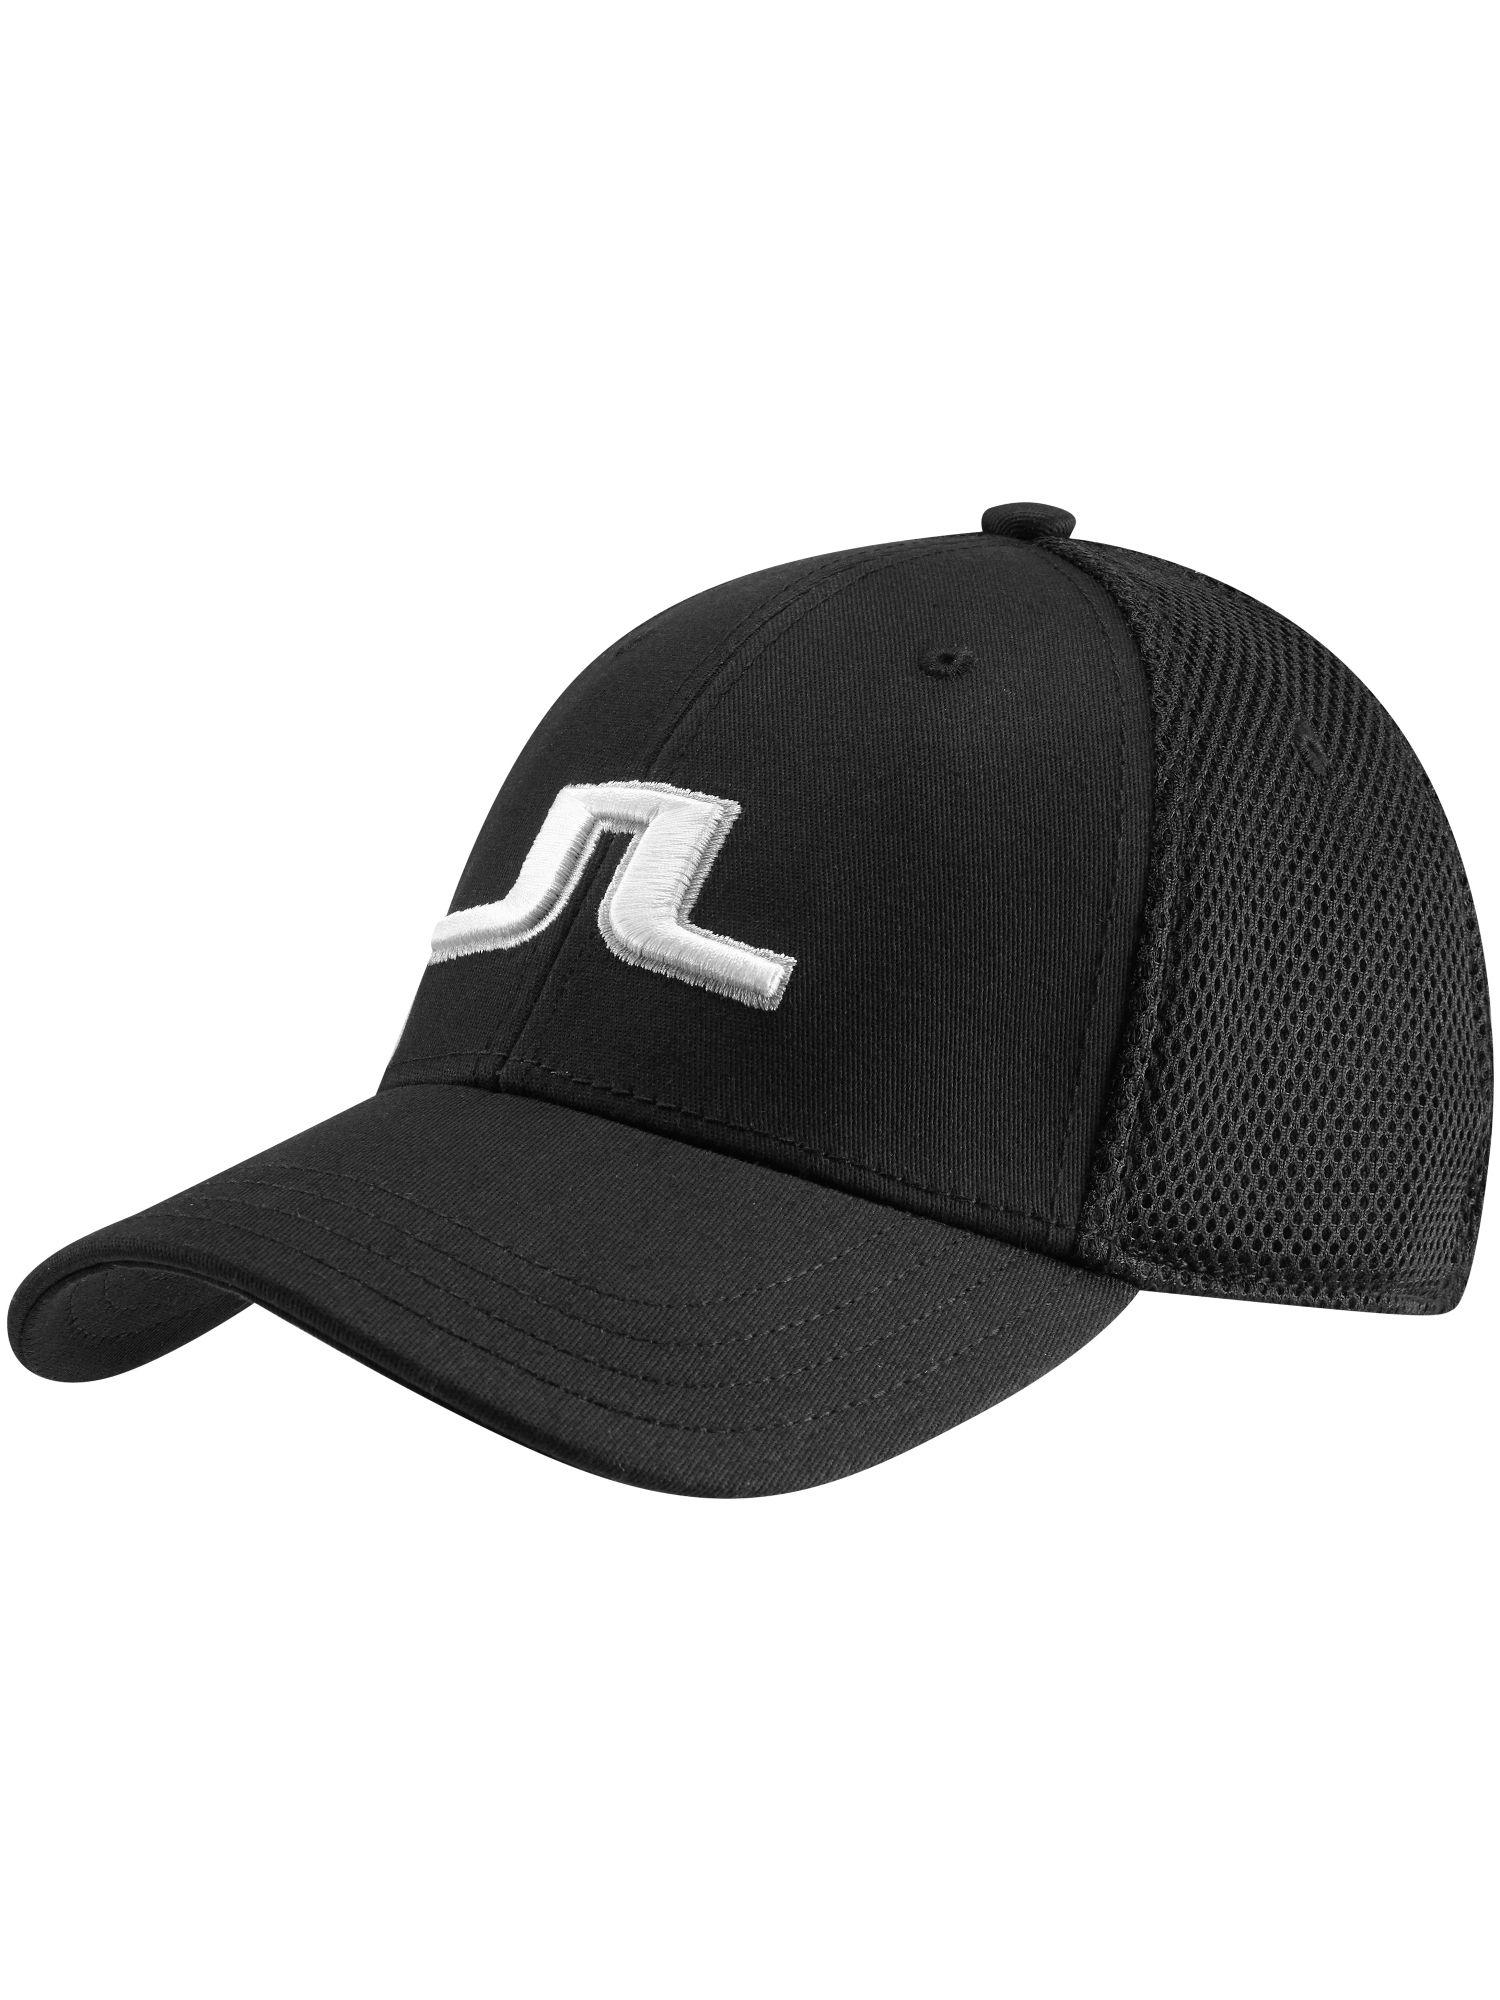 J Lindeberg Bon Flexi Twill Cap In Black For Men Lyst